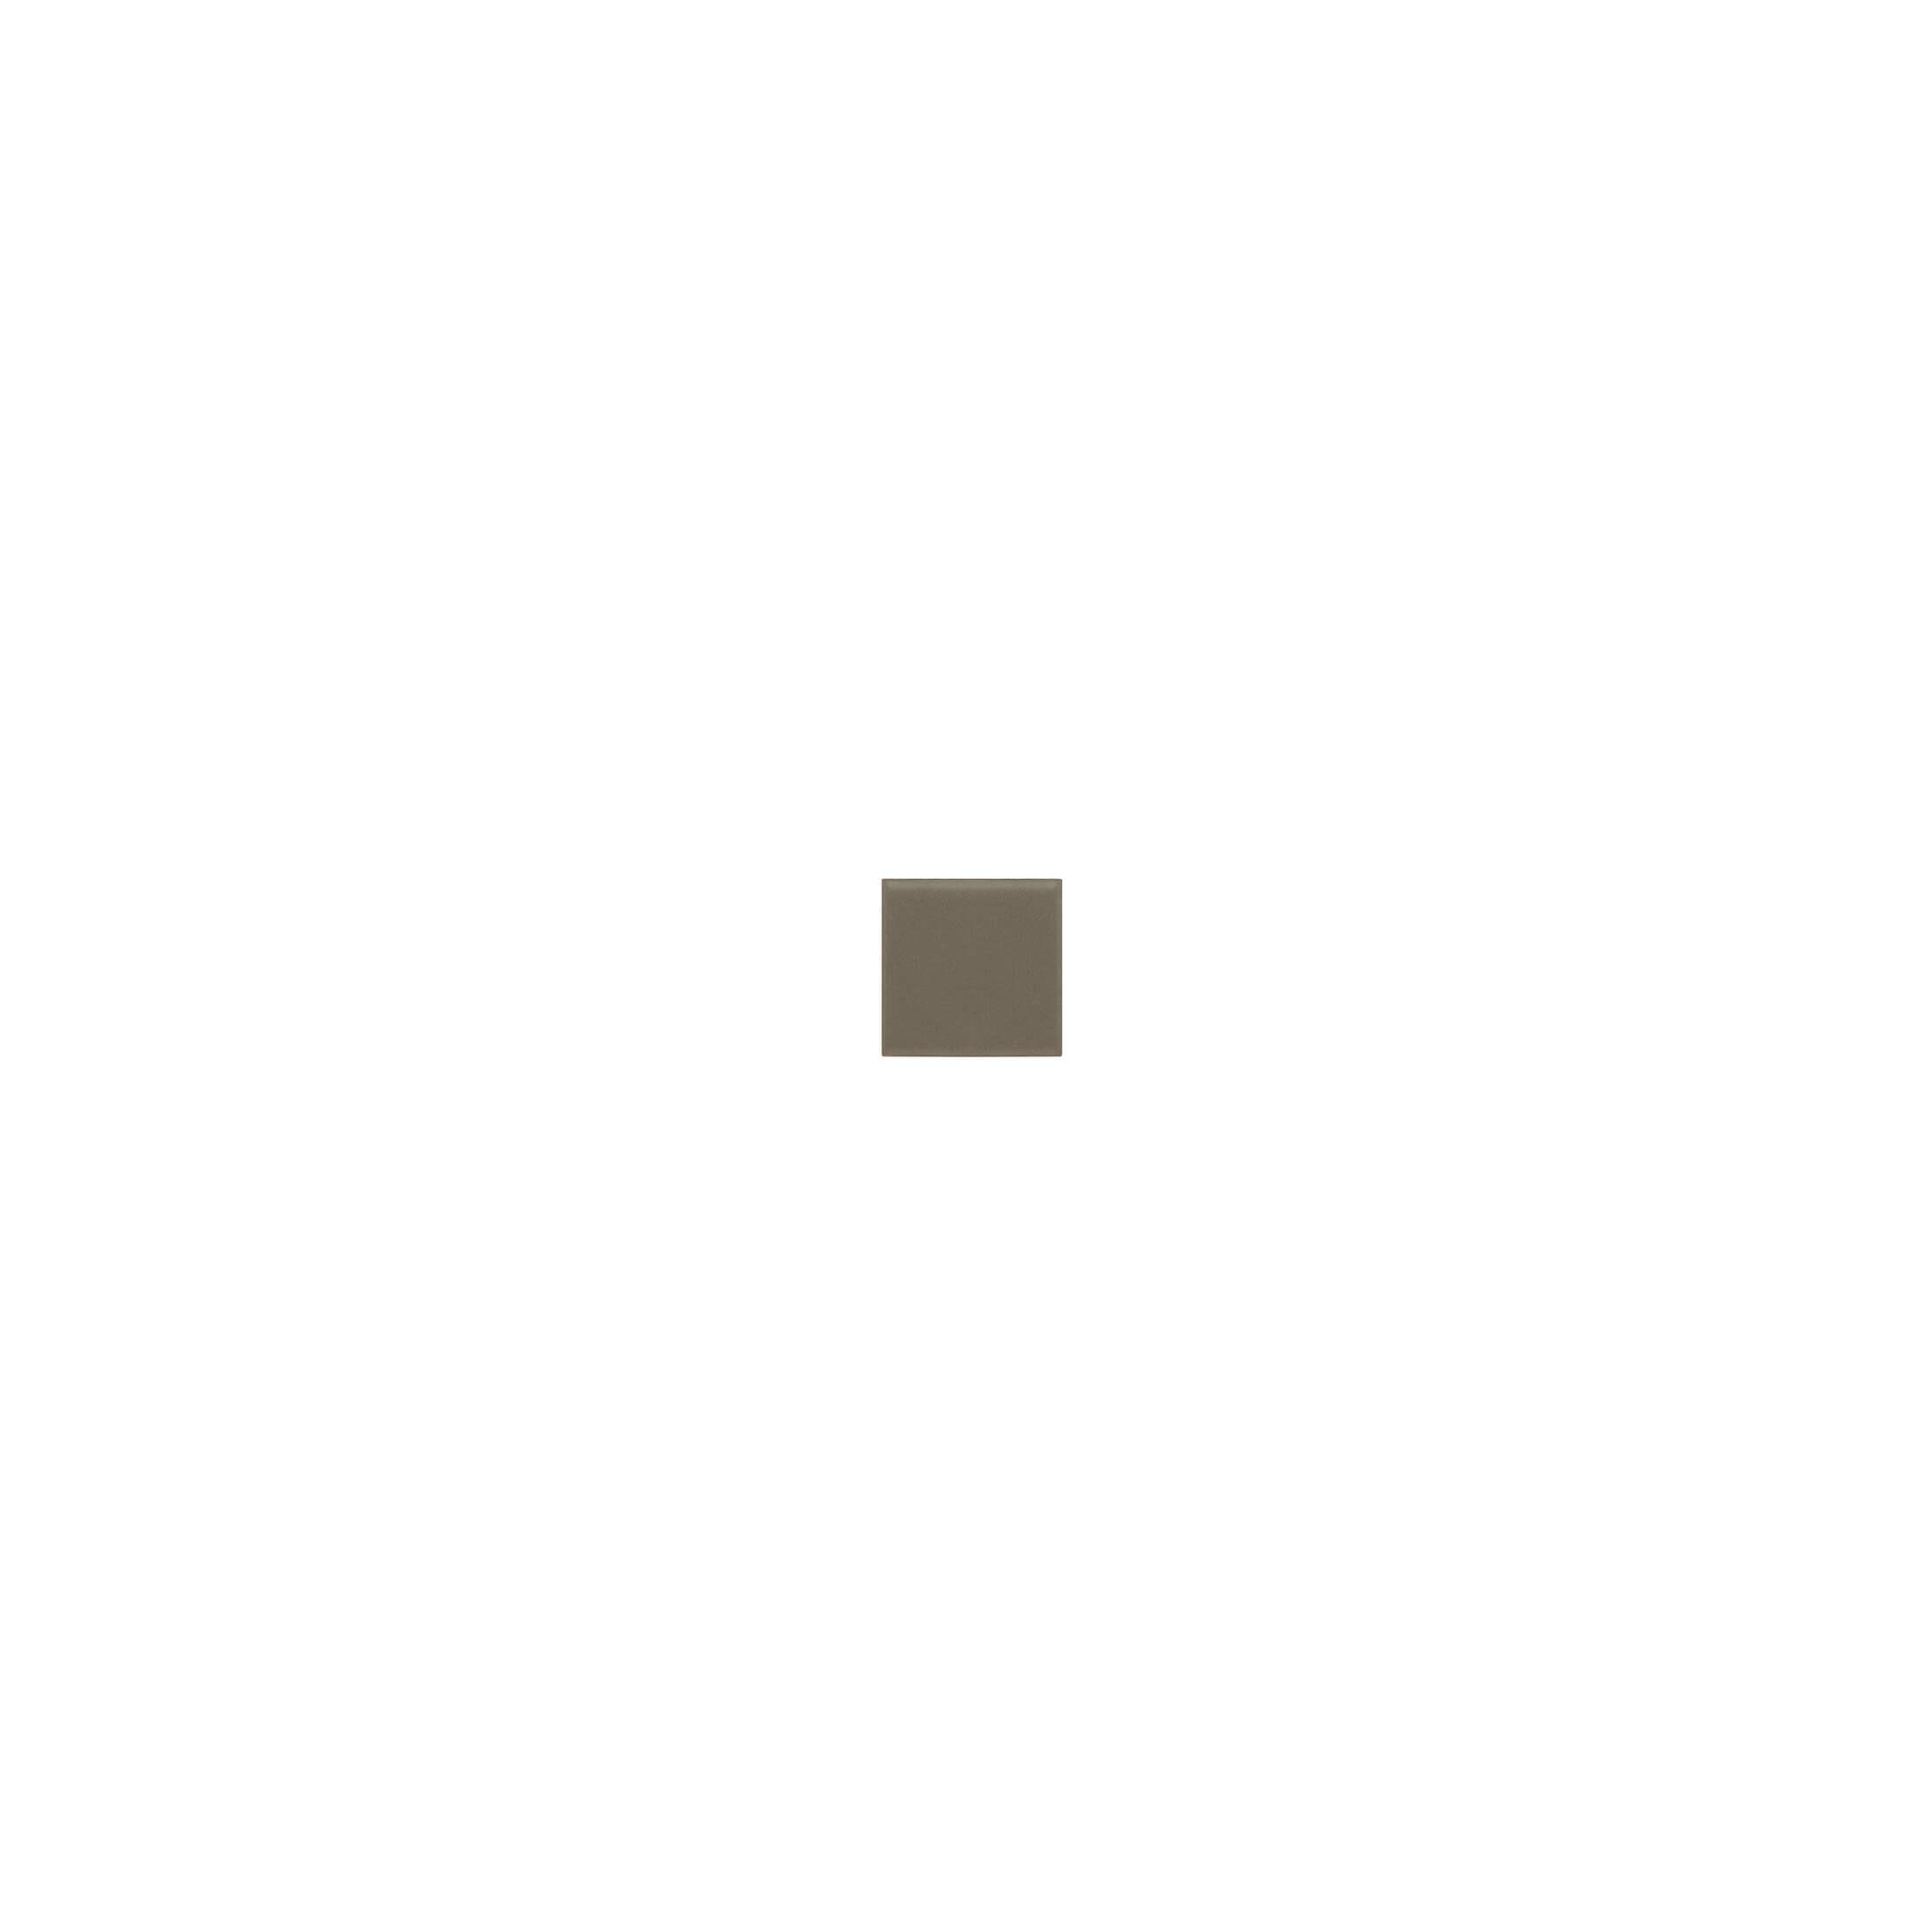 ADPV9006 - PAVIMENTO TACO EUCALYPTUS - 3 cm X 3 cm